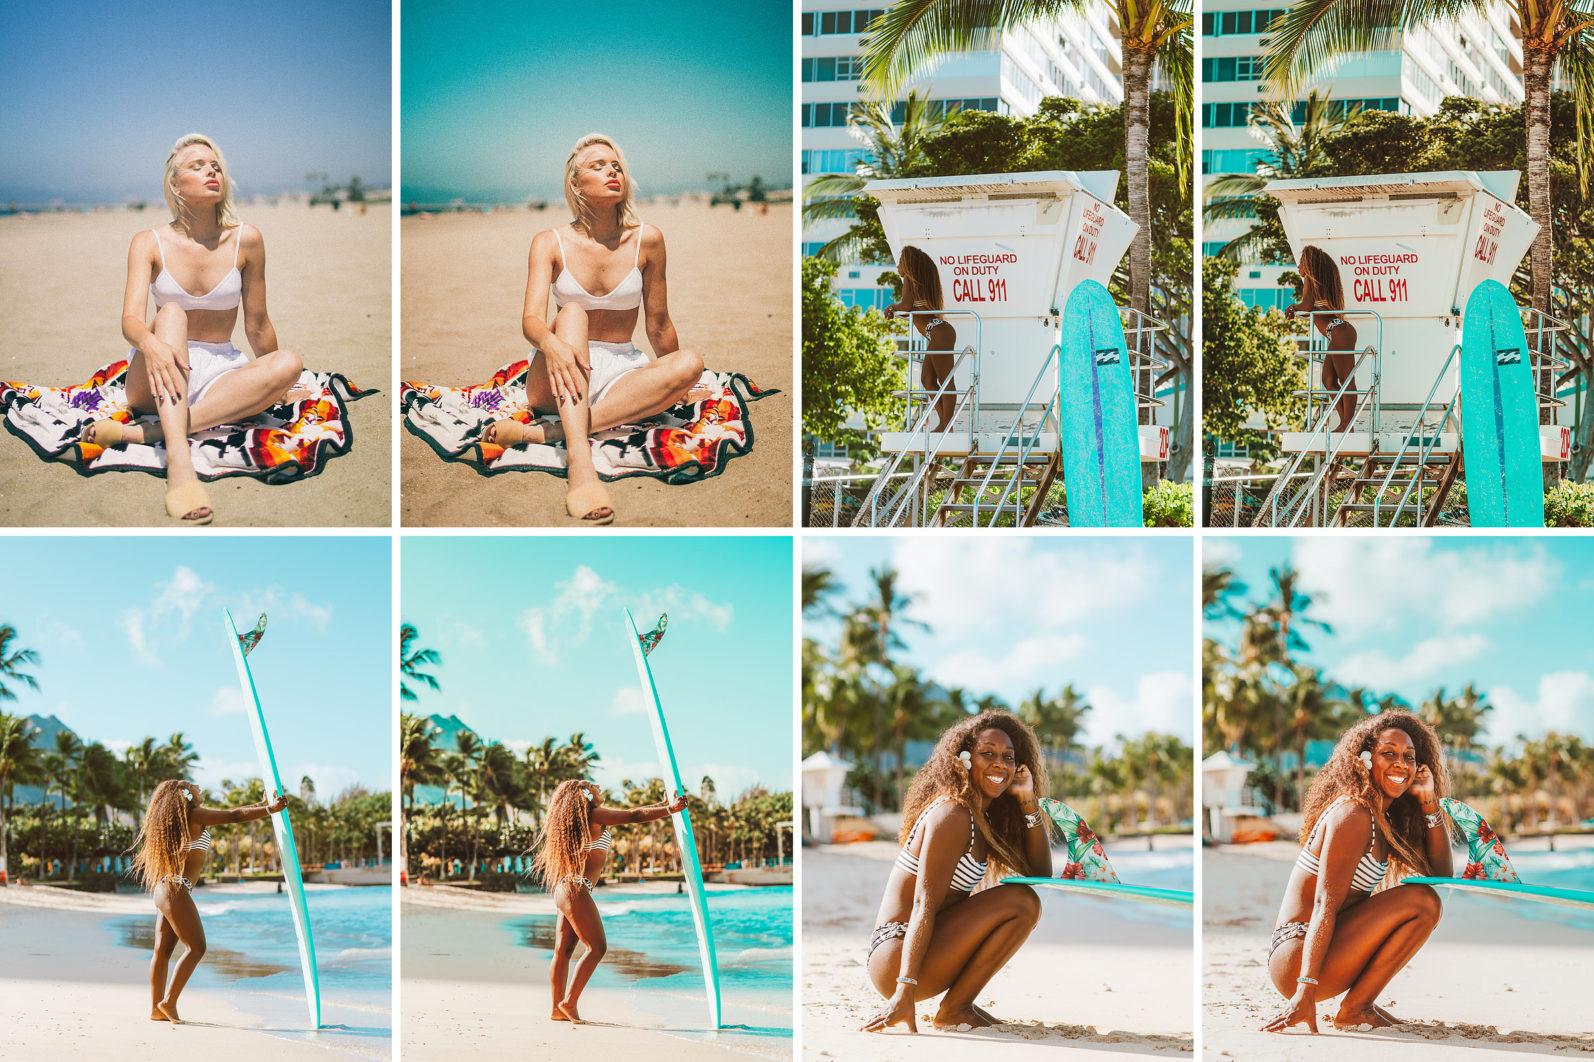 106. Beach Soul Presets - 106.BEACHSOUL 5 -